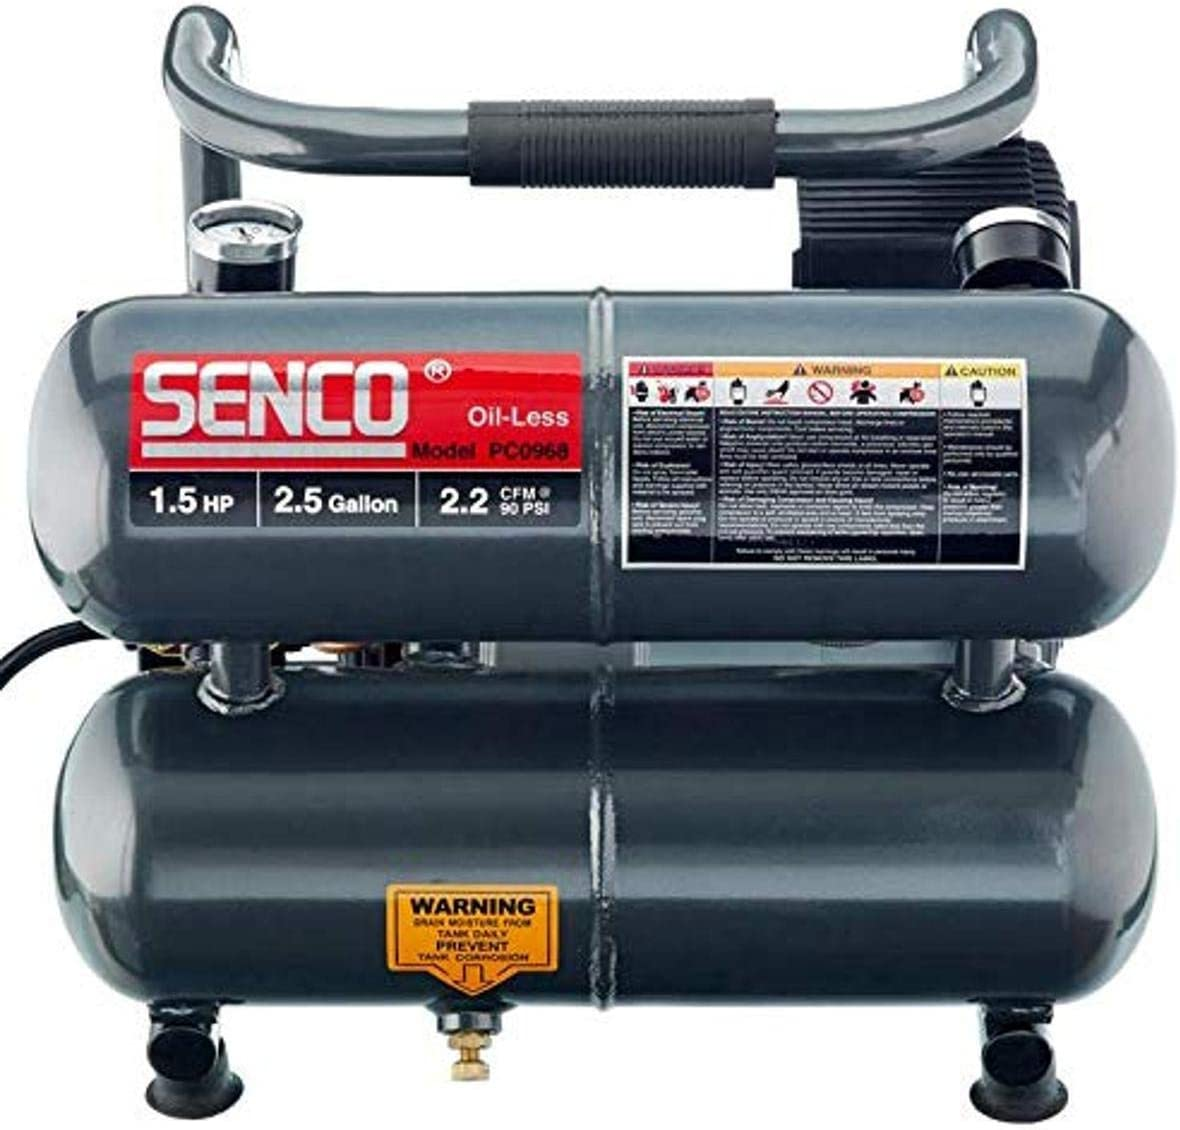 SENCO PC0968 Mini Kompressor